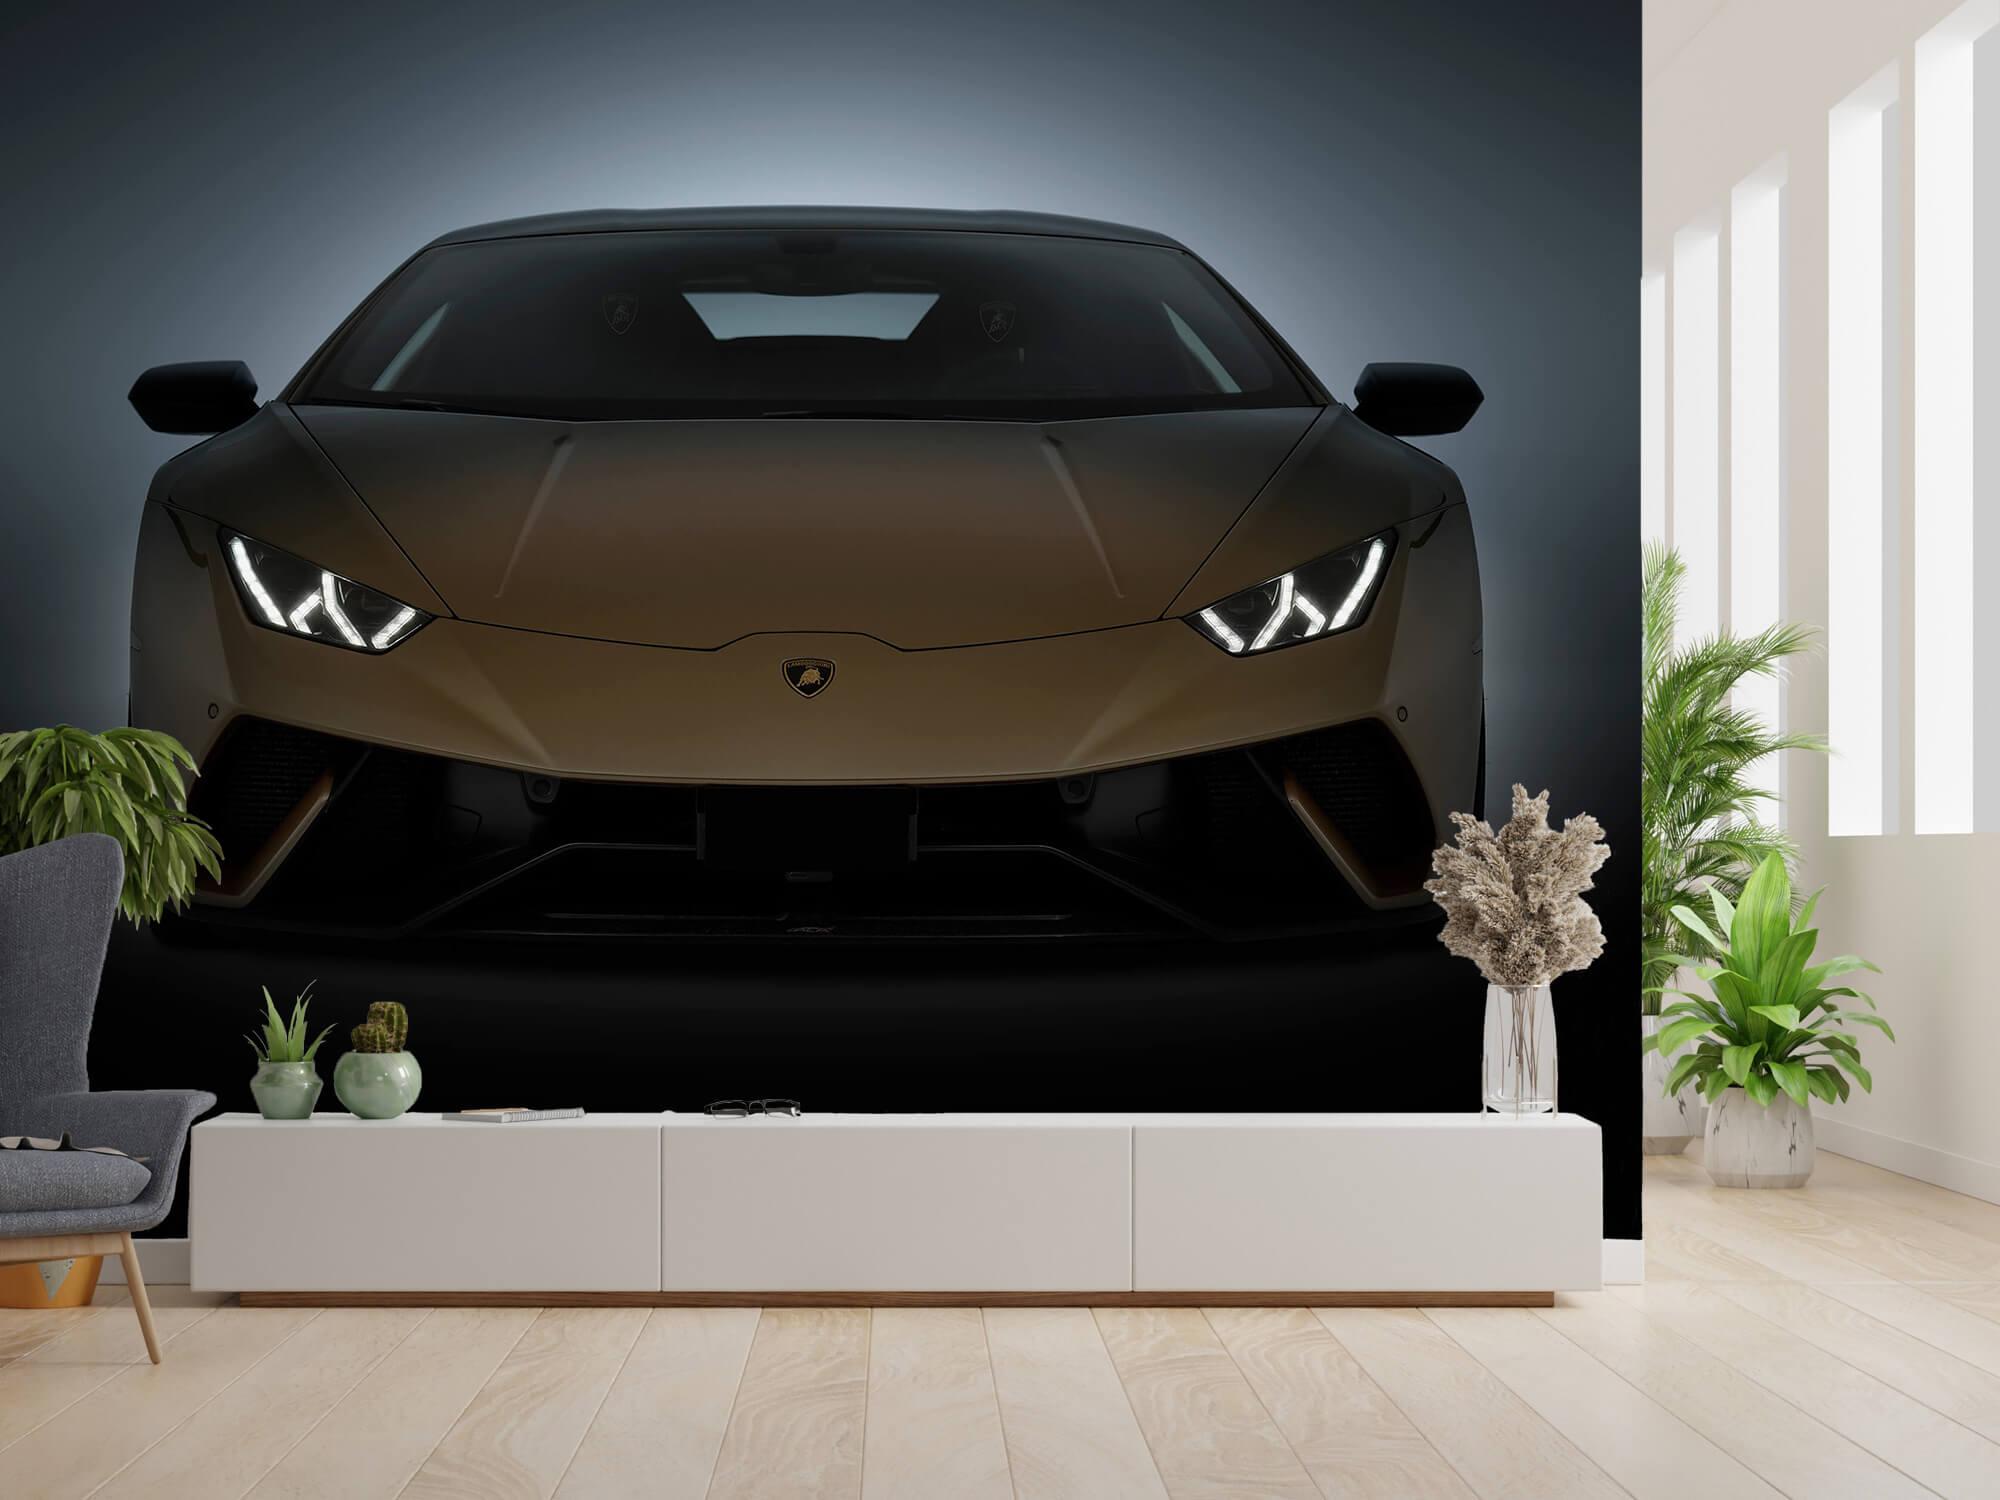 Wallpaper Lamborghini Huracán - Huracán - Fram 1